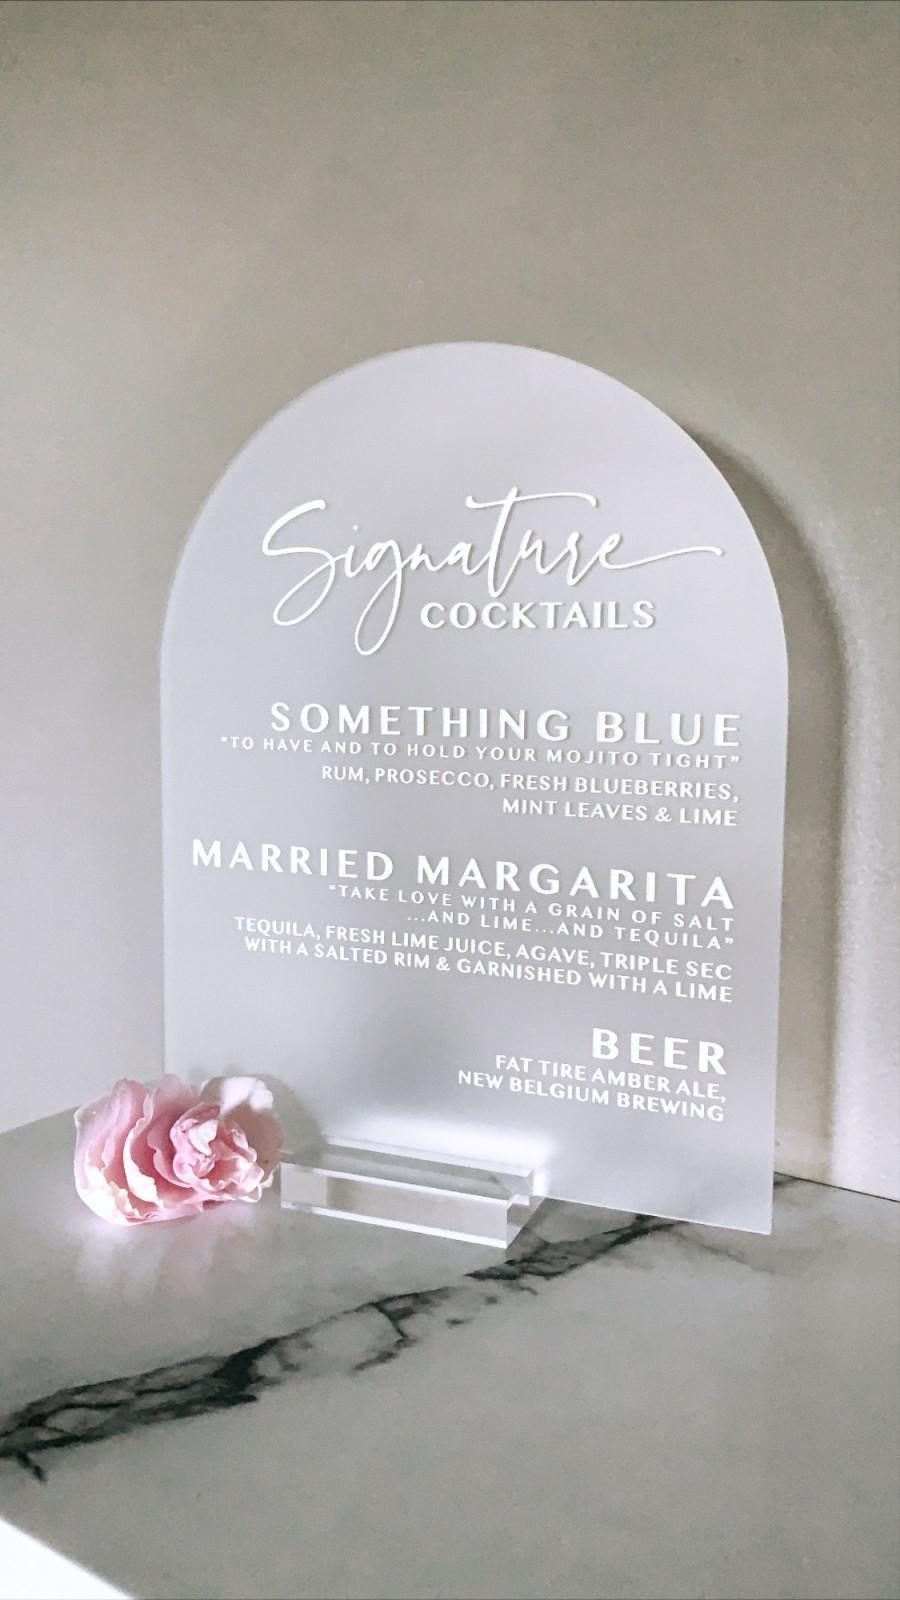 Mariage - Custom Bar Menu Wedding Sign - 8x10 Dome - Bar Sign - Signature Cocktails - Engraved Acrylic - Wedding Decor